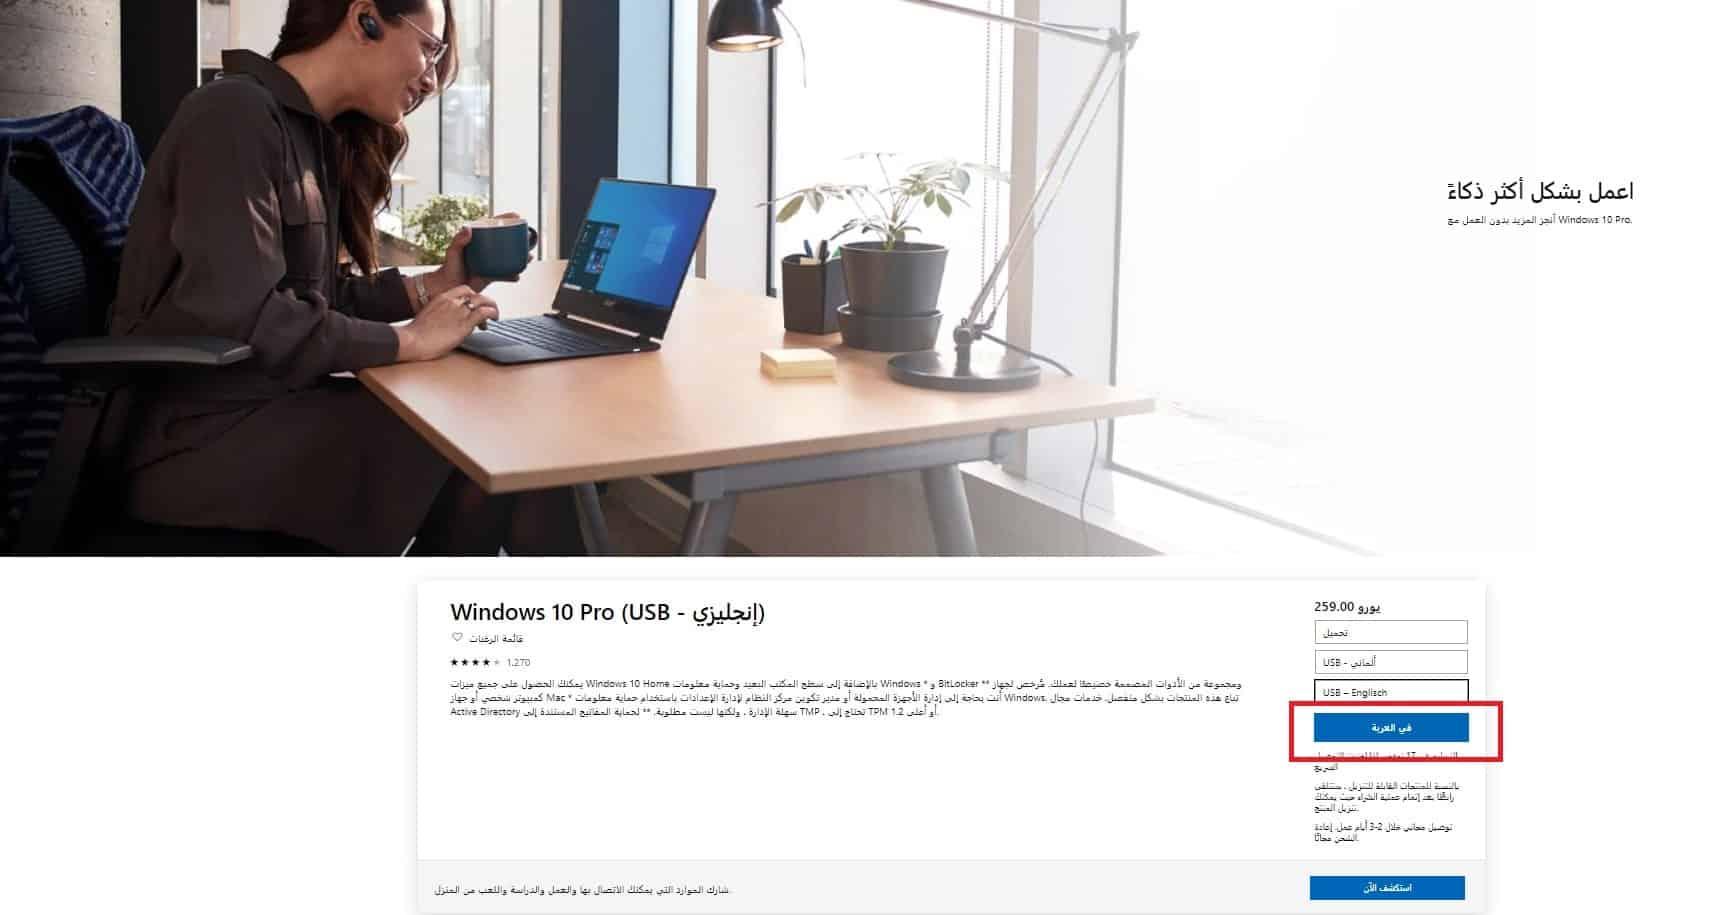 شراء ويندوز 10 من مايكروسوفت